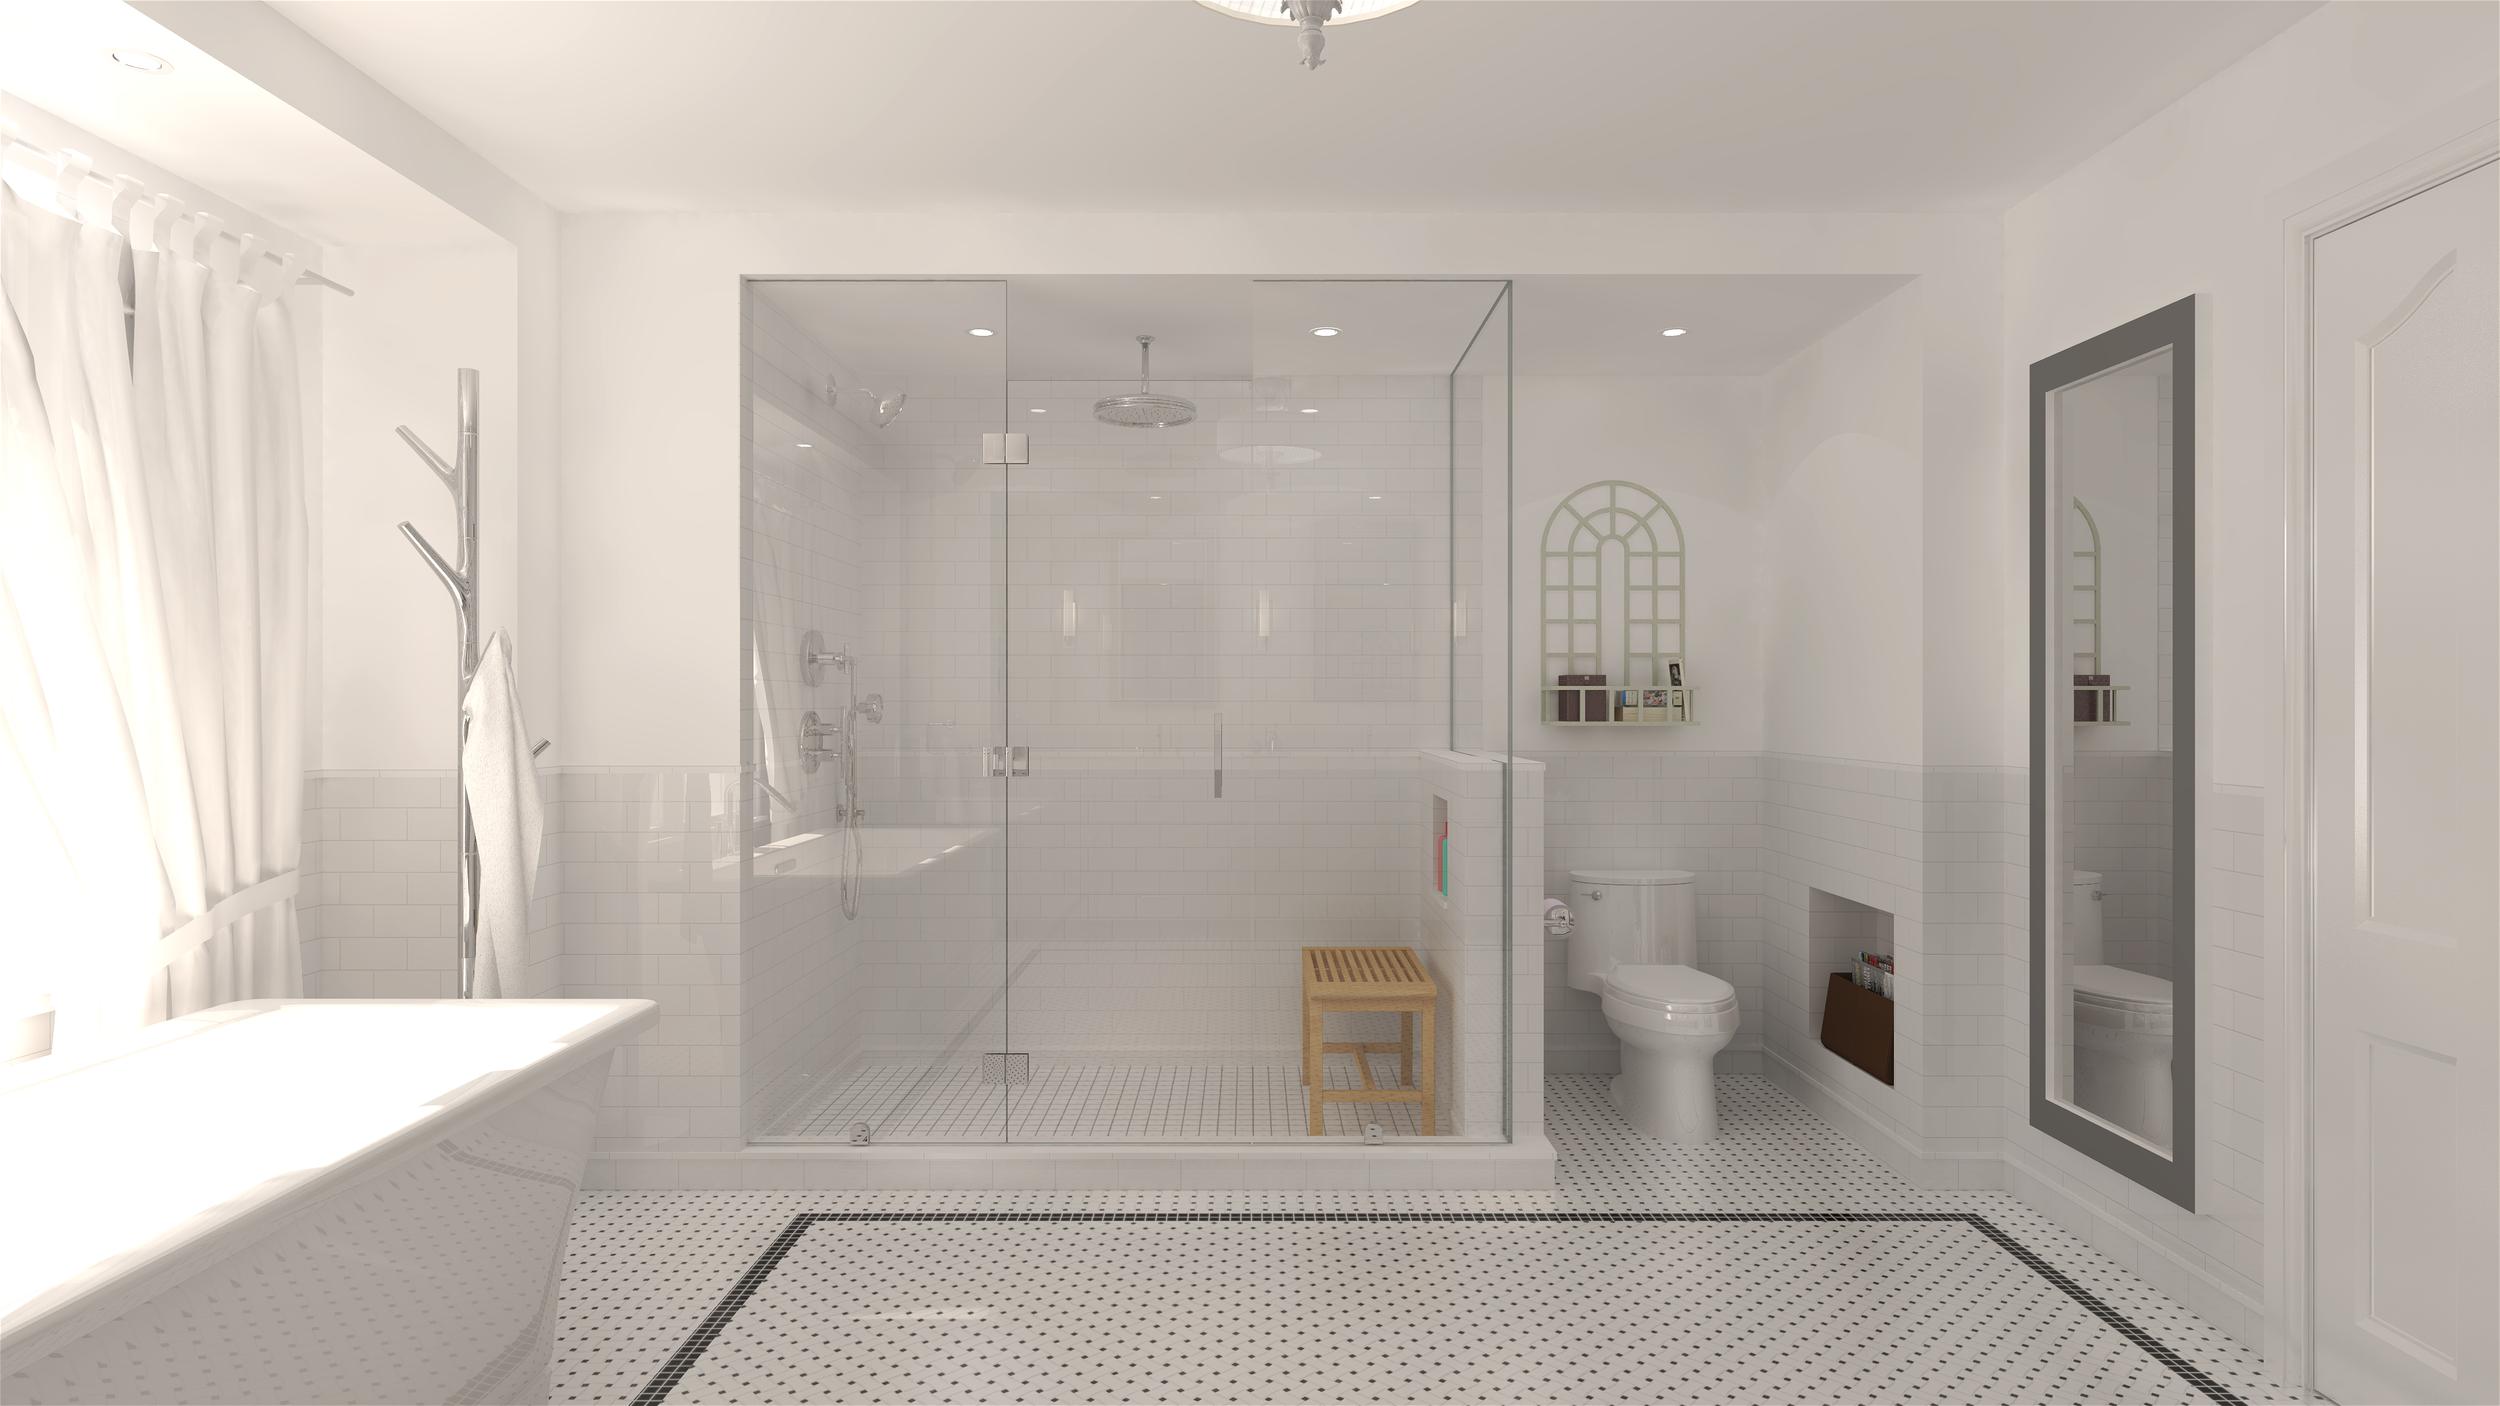 deSousaDESIGN_Bathroom_Classic_Ensuite_V1d_3840x2160.png